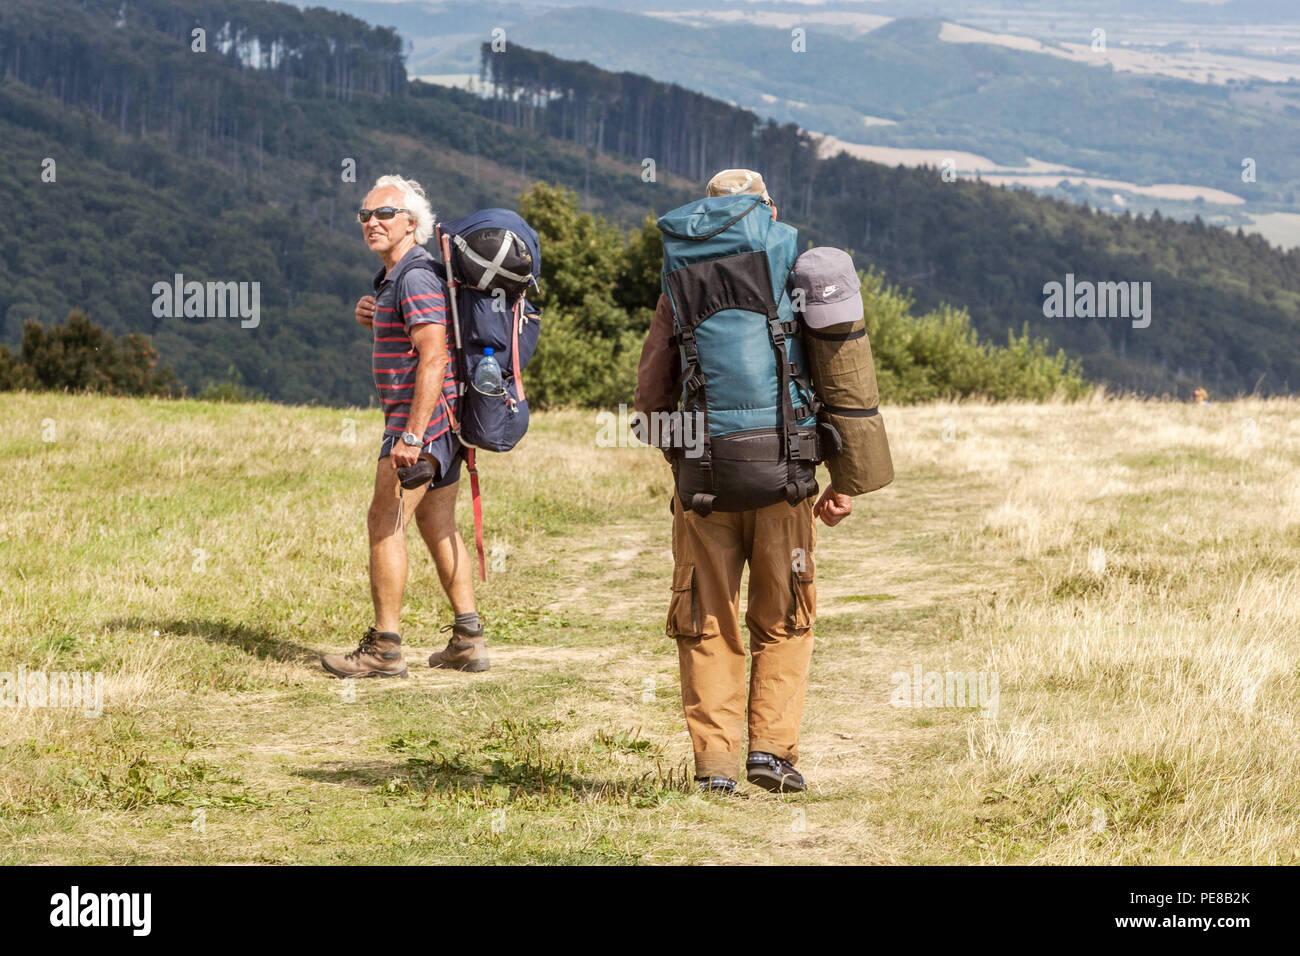 Seniors hiking, Bile Karpaty Mountains, White Carpathians, Czech Slovakian border, Czech Republic, Slovakia - Stock Image